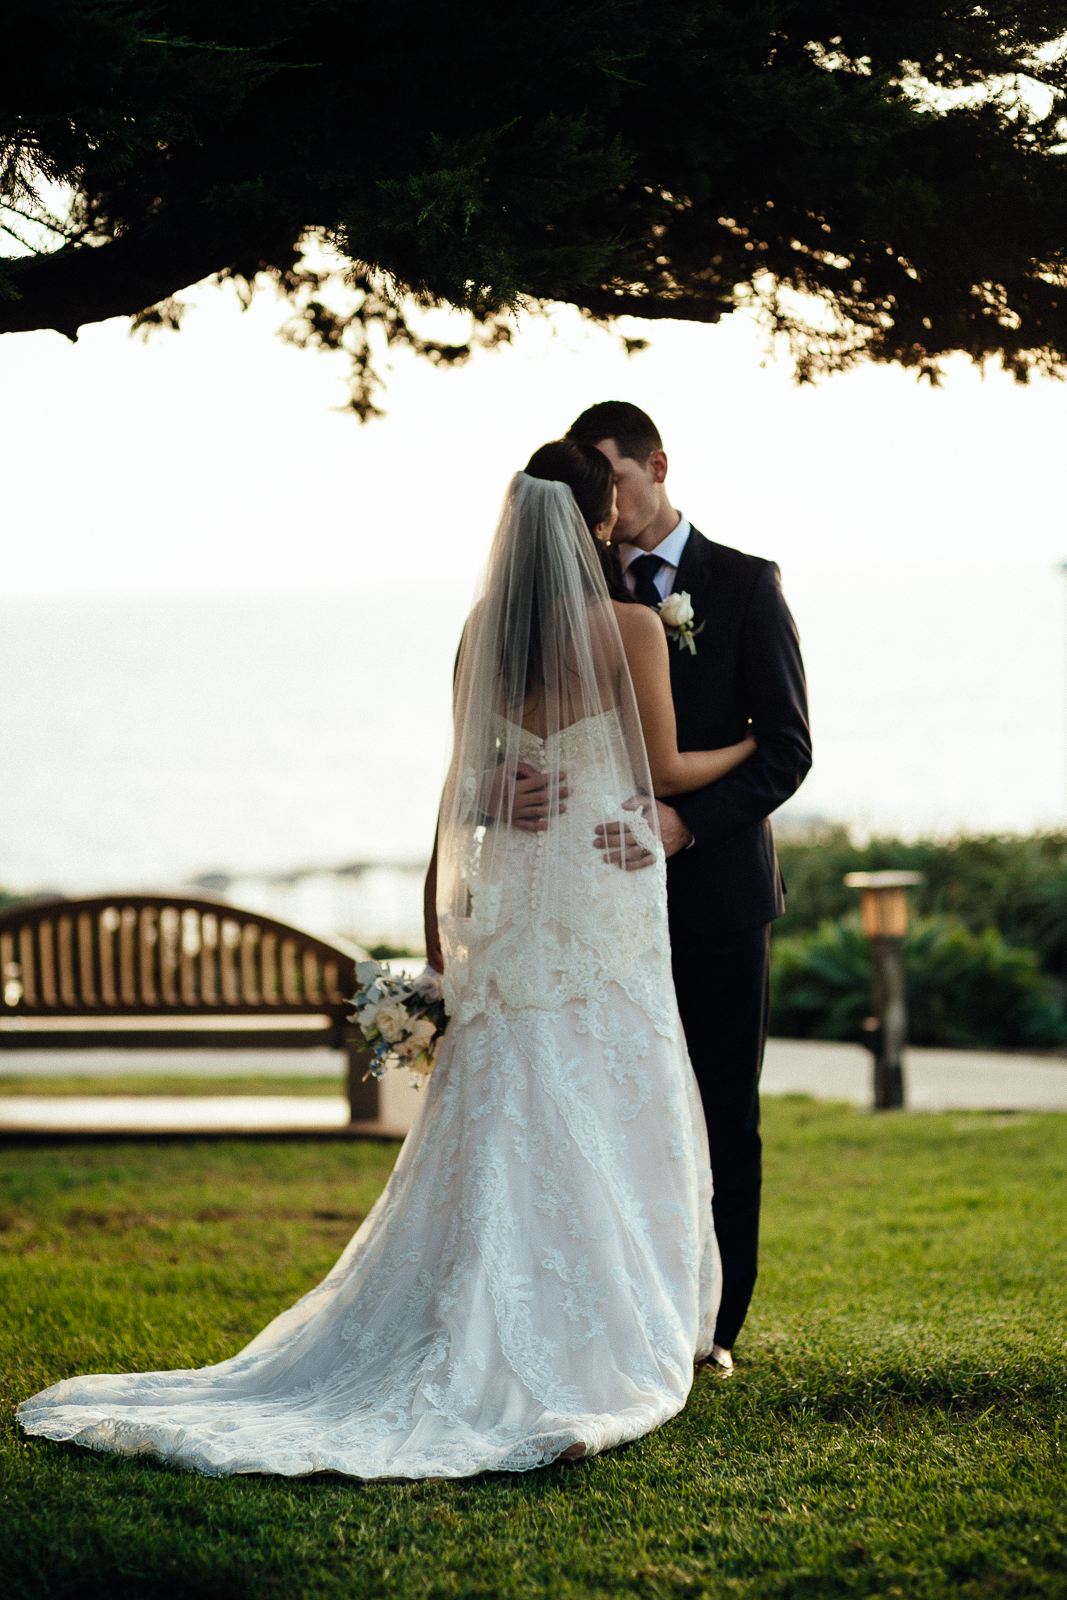 ERIN_&_JARED_WEDDING_MARTIN_JOHNSON_HOUSE_2015_IMG_9324.JPG